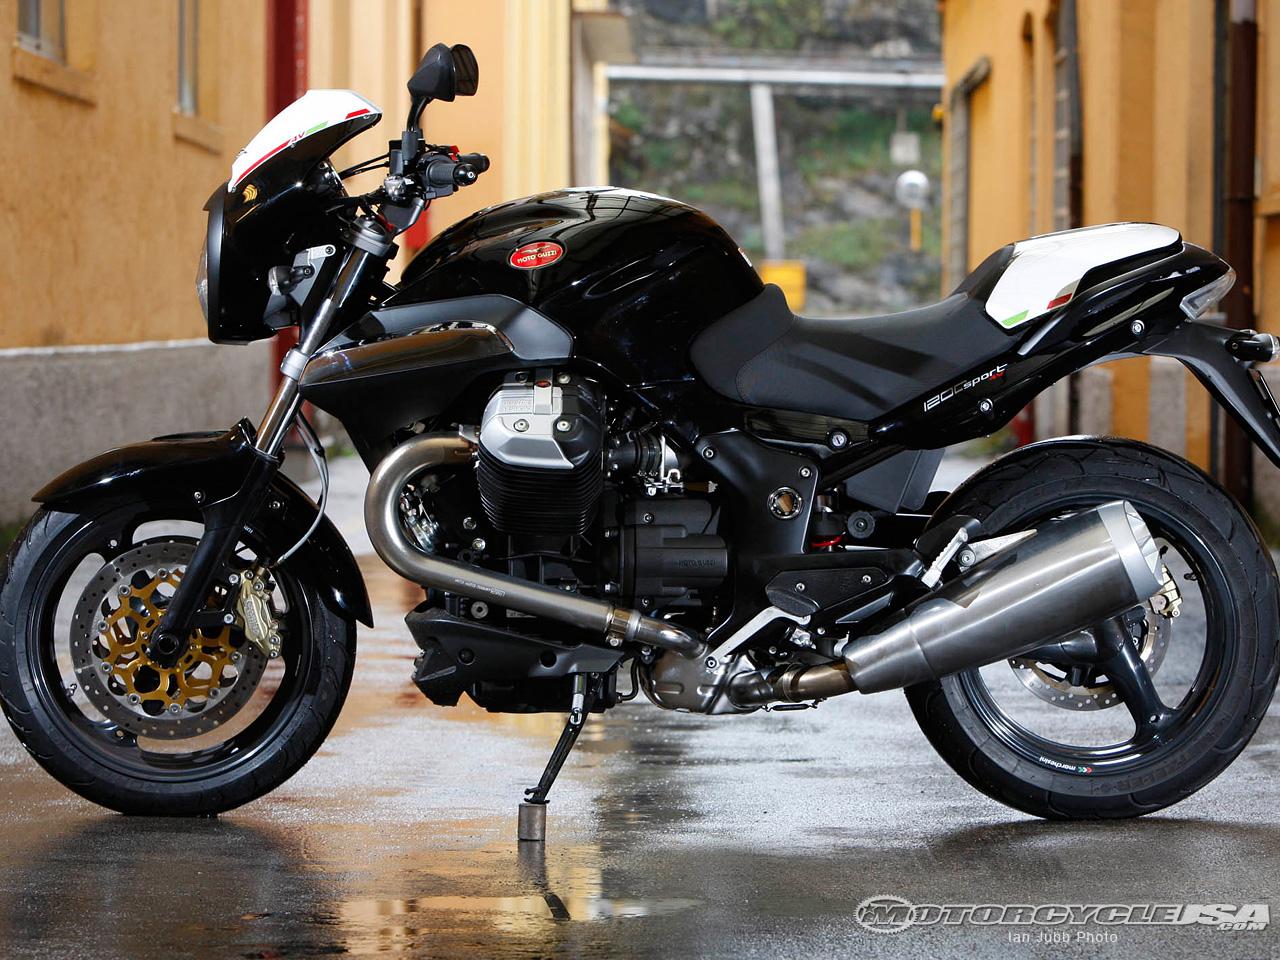 MOTO GUZZI 1200 SPORT black